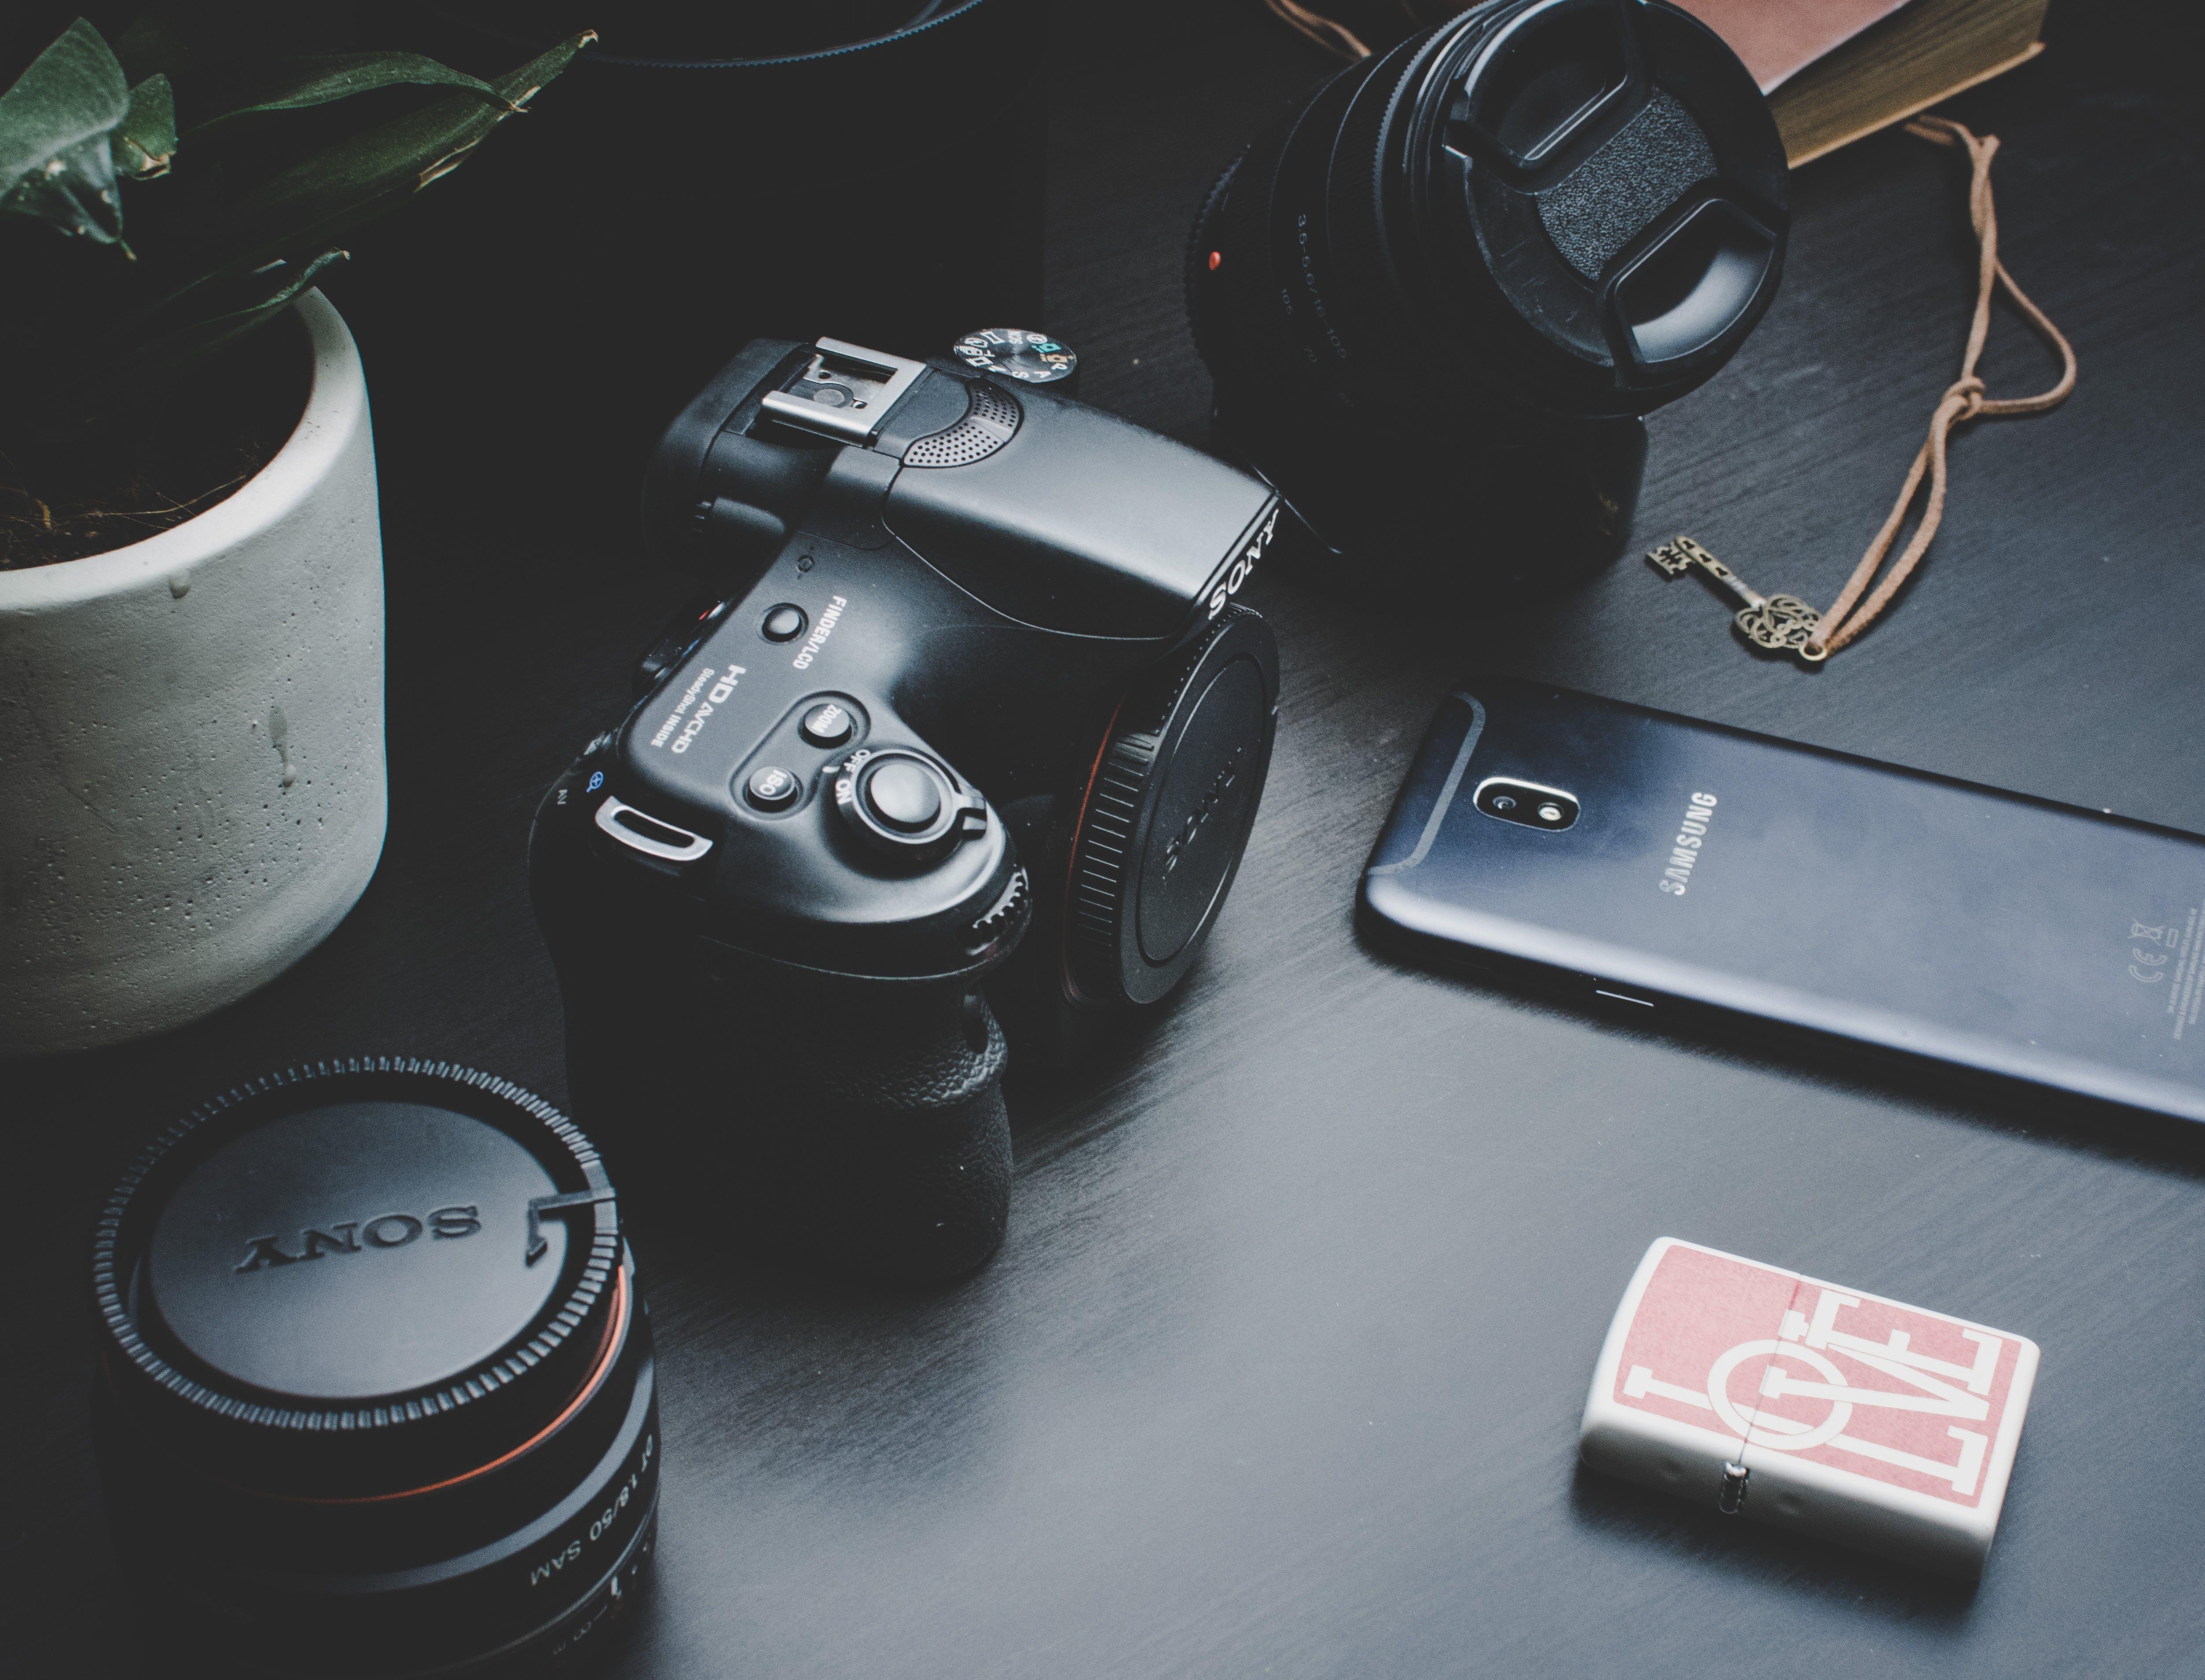 Black Sony Dlsr Camera